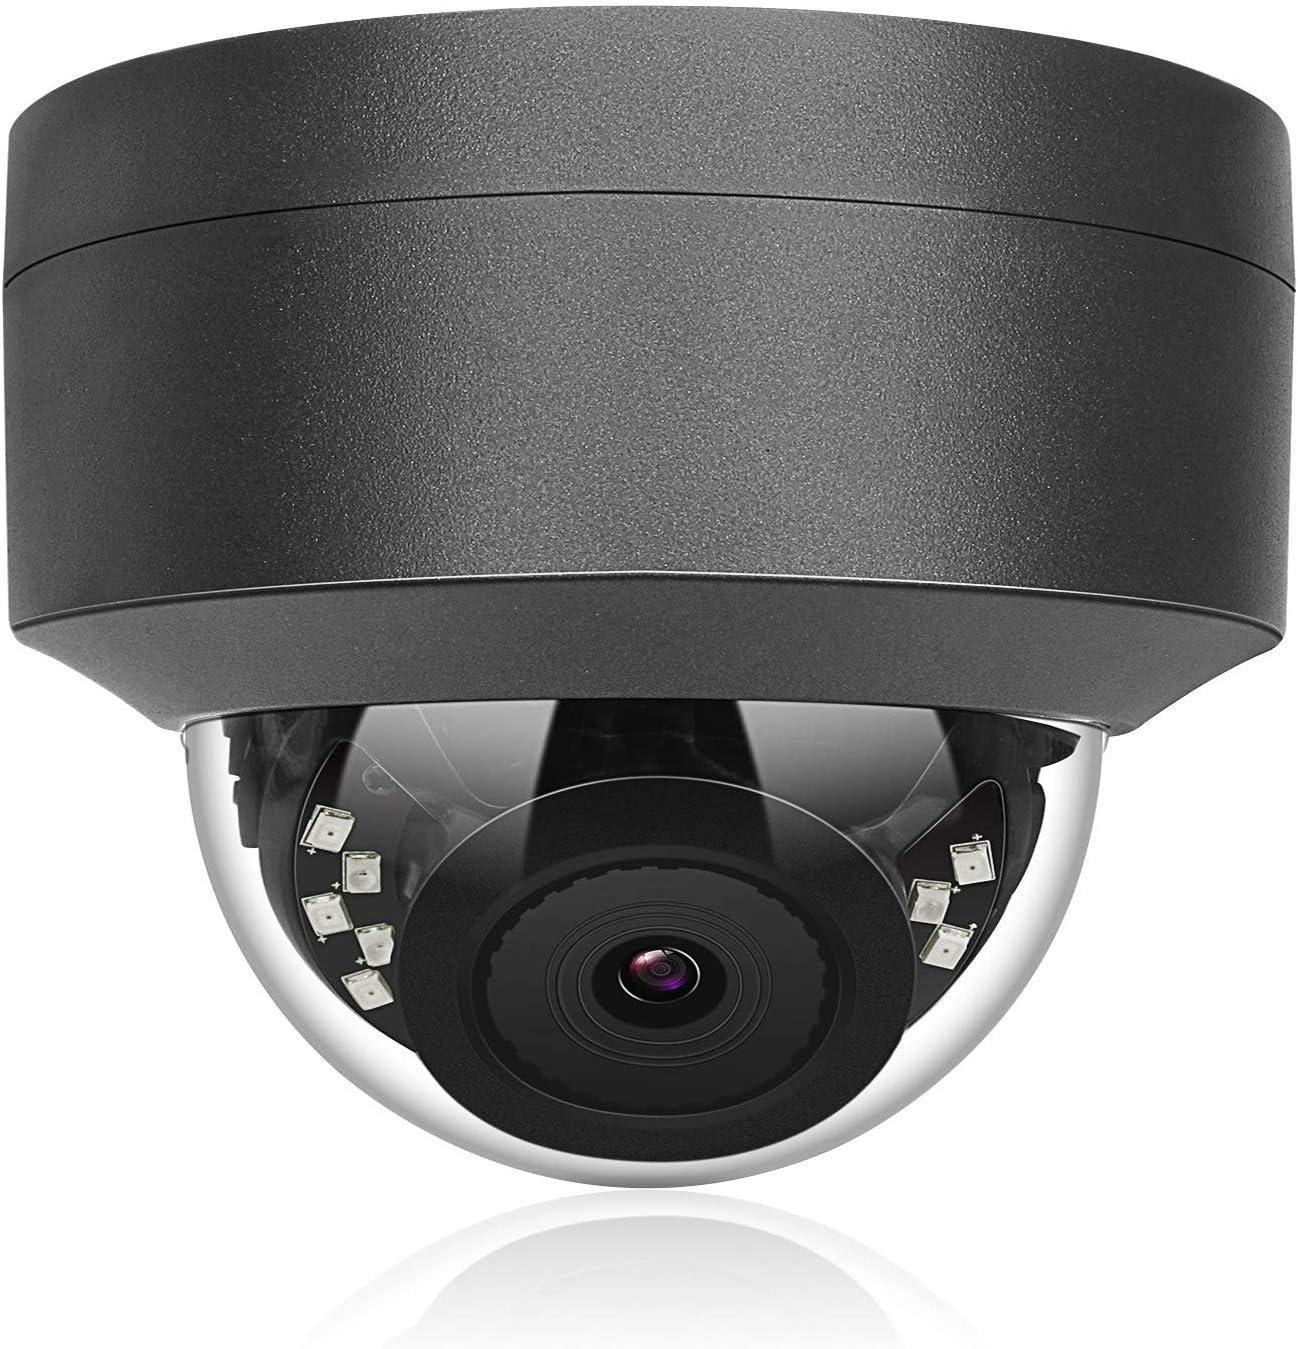 (Hikvision Compatible) Anpviz 5MP IP POE Dome Camera Motorized 4X Optical vari-Focal 2.8~12mm AutoFocus Wide Angle Security Camera Indoor Outdoor Weatherproof Onvif Surveillance Camera #IPC-D250G-4X